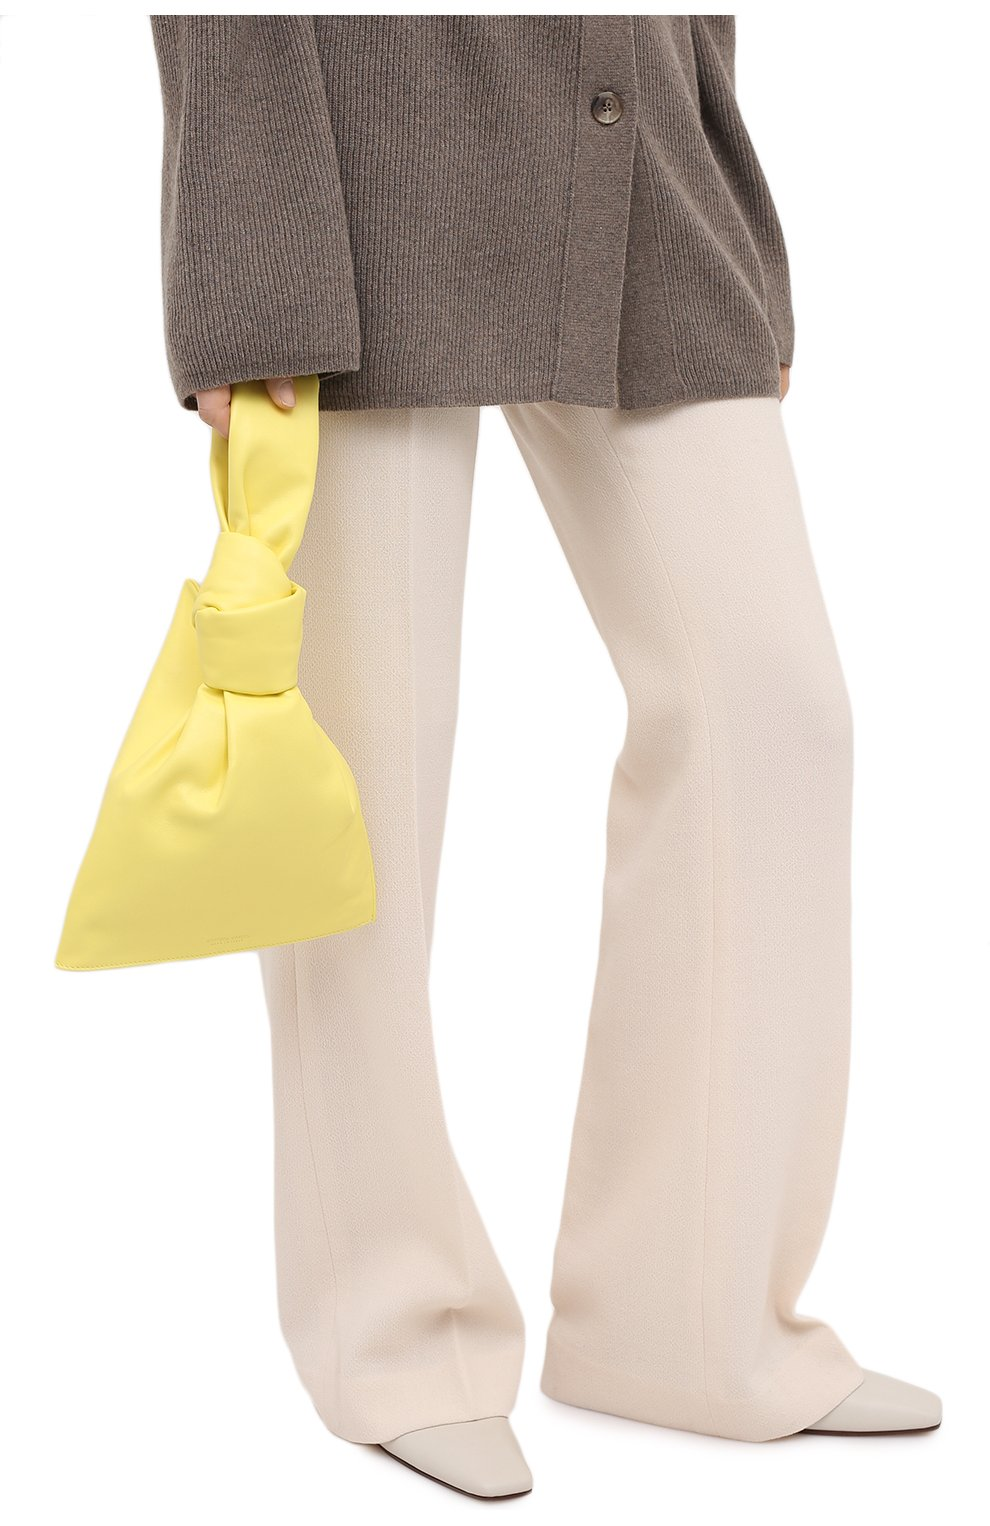 Женская сумка twist mini BOTTEGA VENETA желтого цвета, арт. 652001/VCP40 | Фото 2 (Сумки-технические: Сумки top-handle; Материал: Натуральная кожа; Размер: mini)